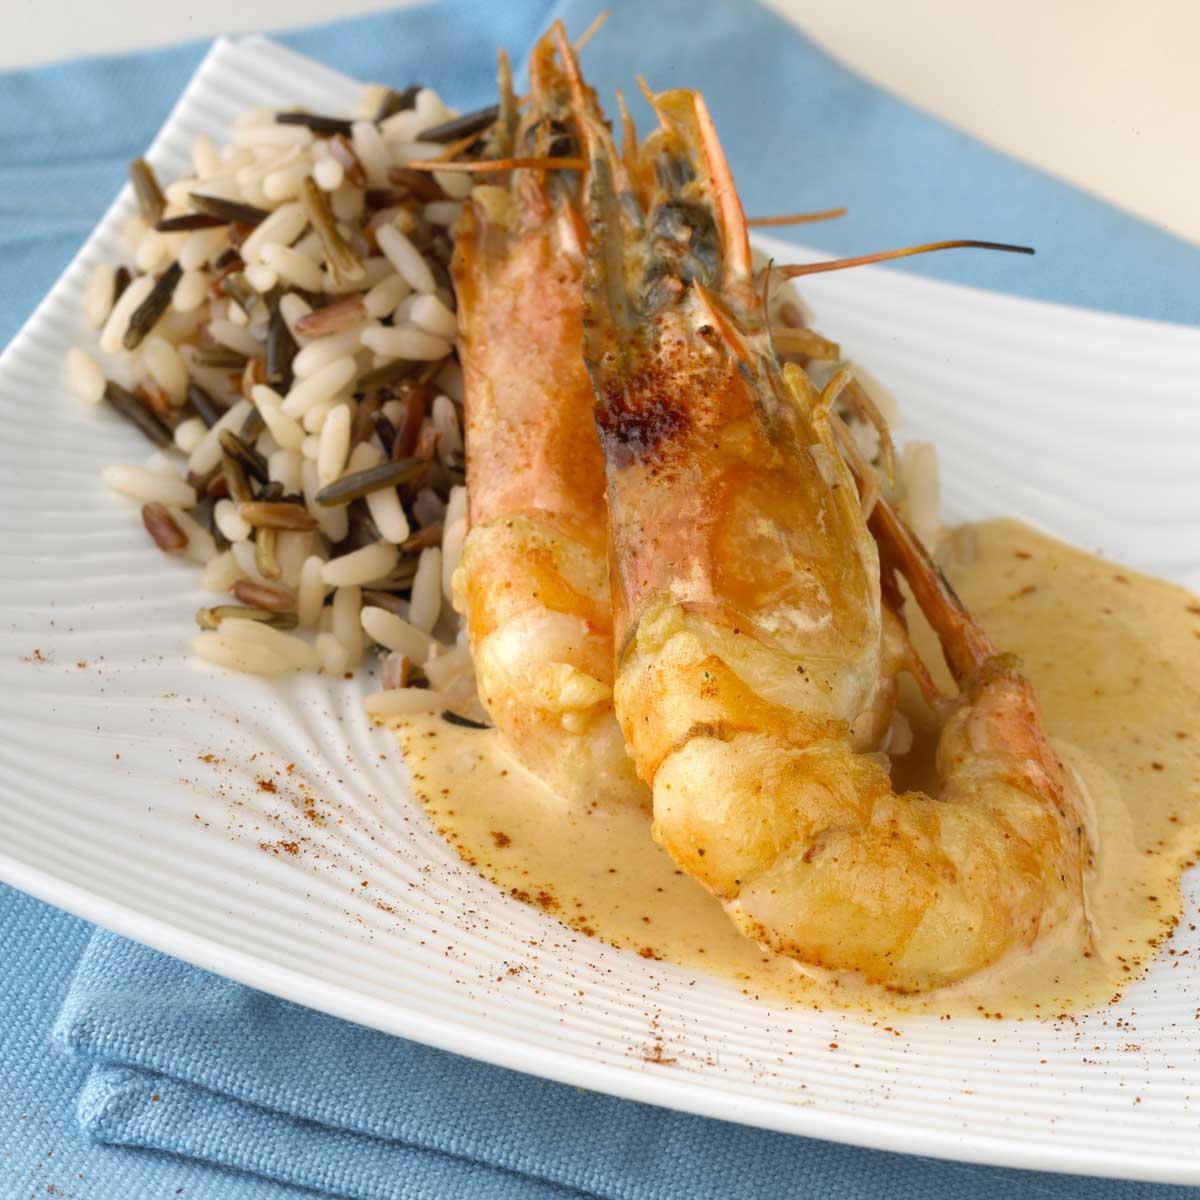 Recette gambas flamb es la cr me de paprika riz sauvage cuisine madame figaro - Accompagnement gambas grillees ...